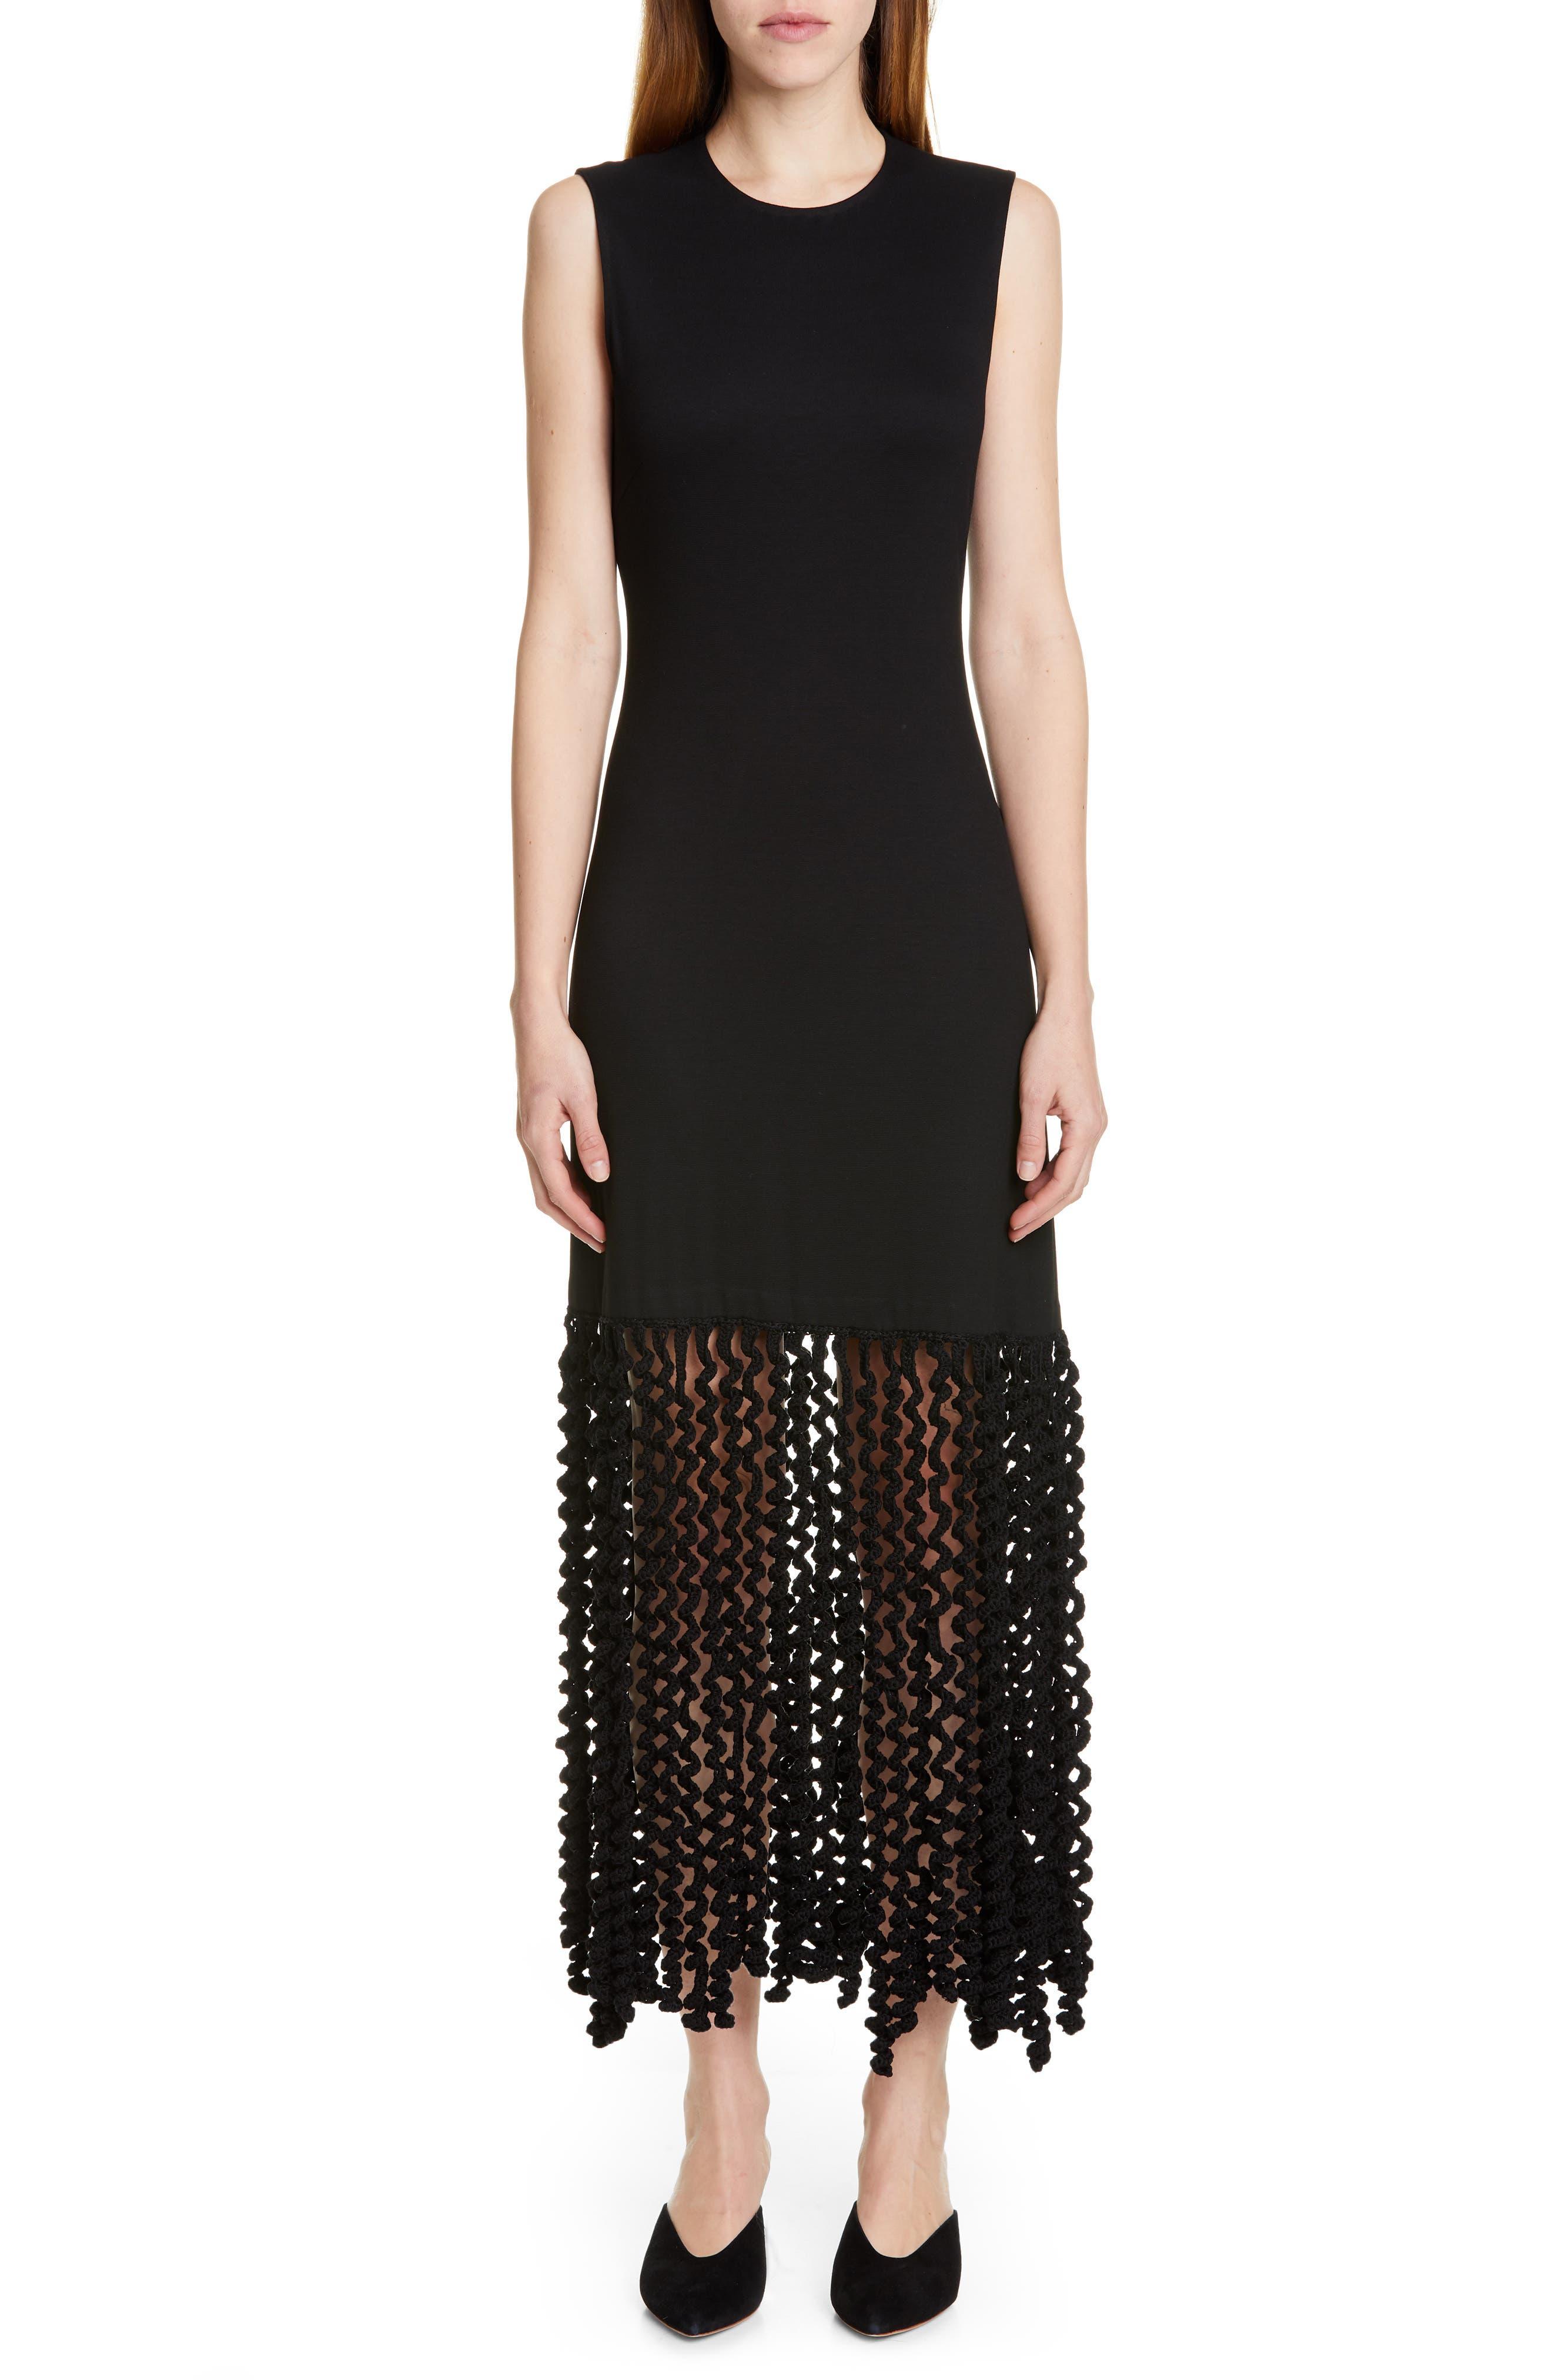 ROSETTA GETTY, Spiral Fringe Maxi Dress, Main thumbnail 1, color, BLACK